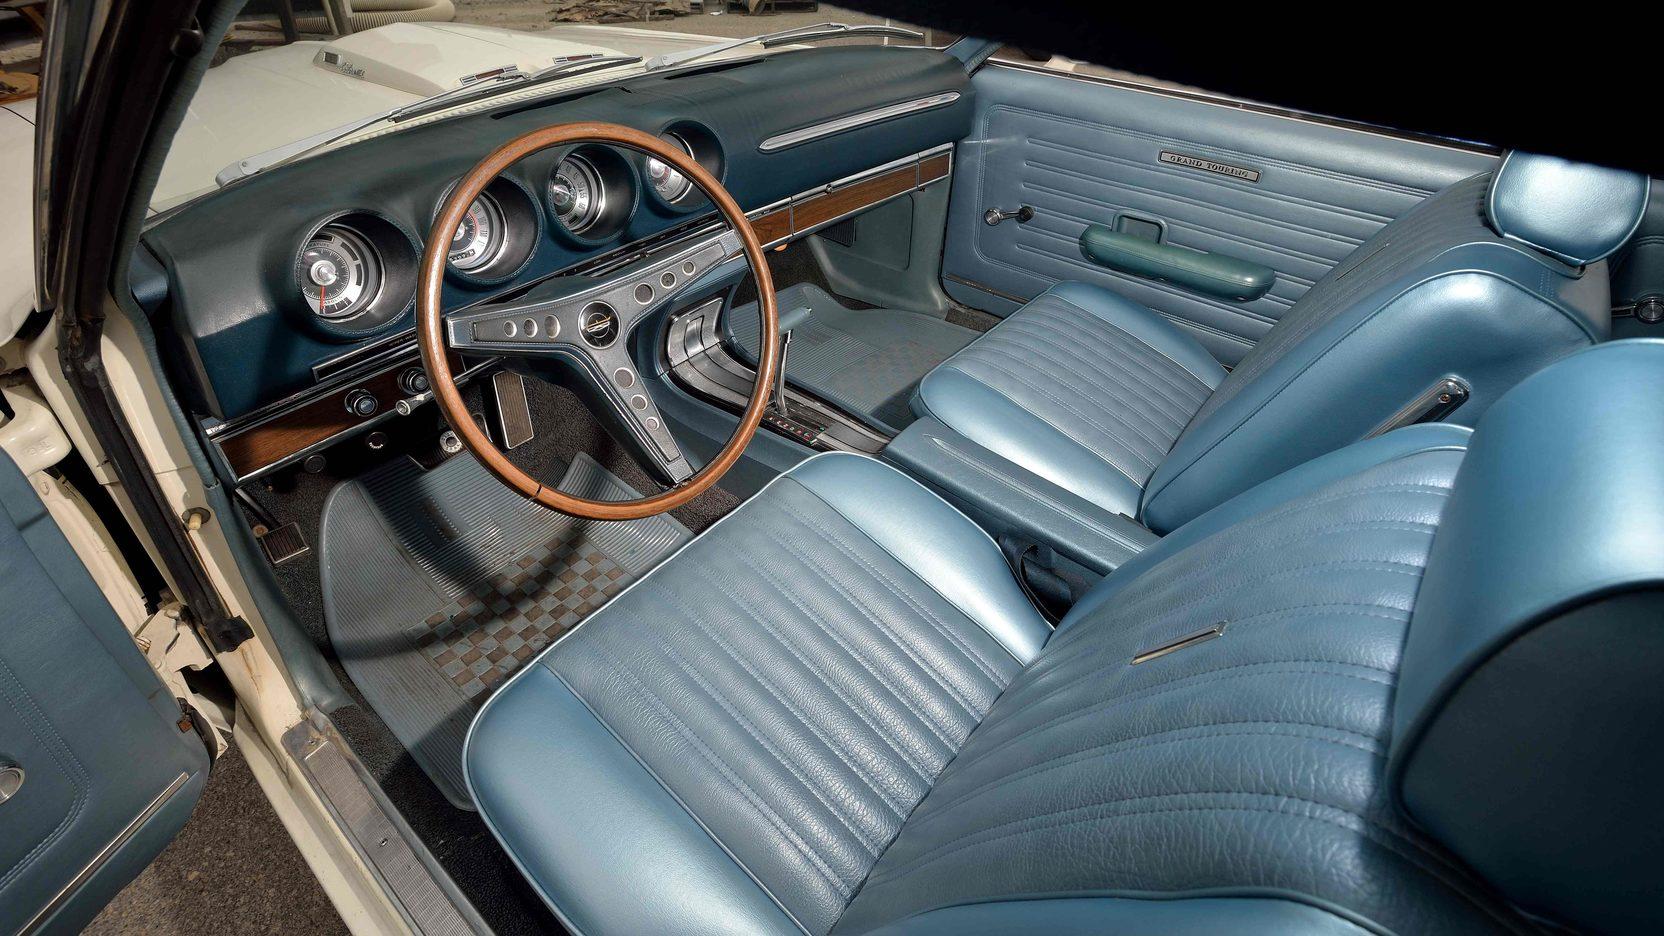 1969 Ford Torino GT interior